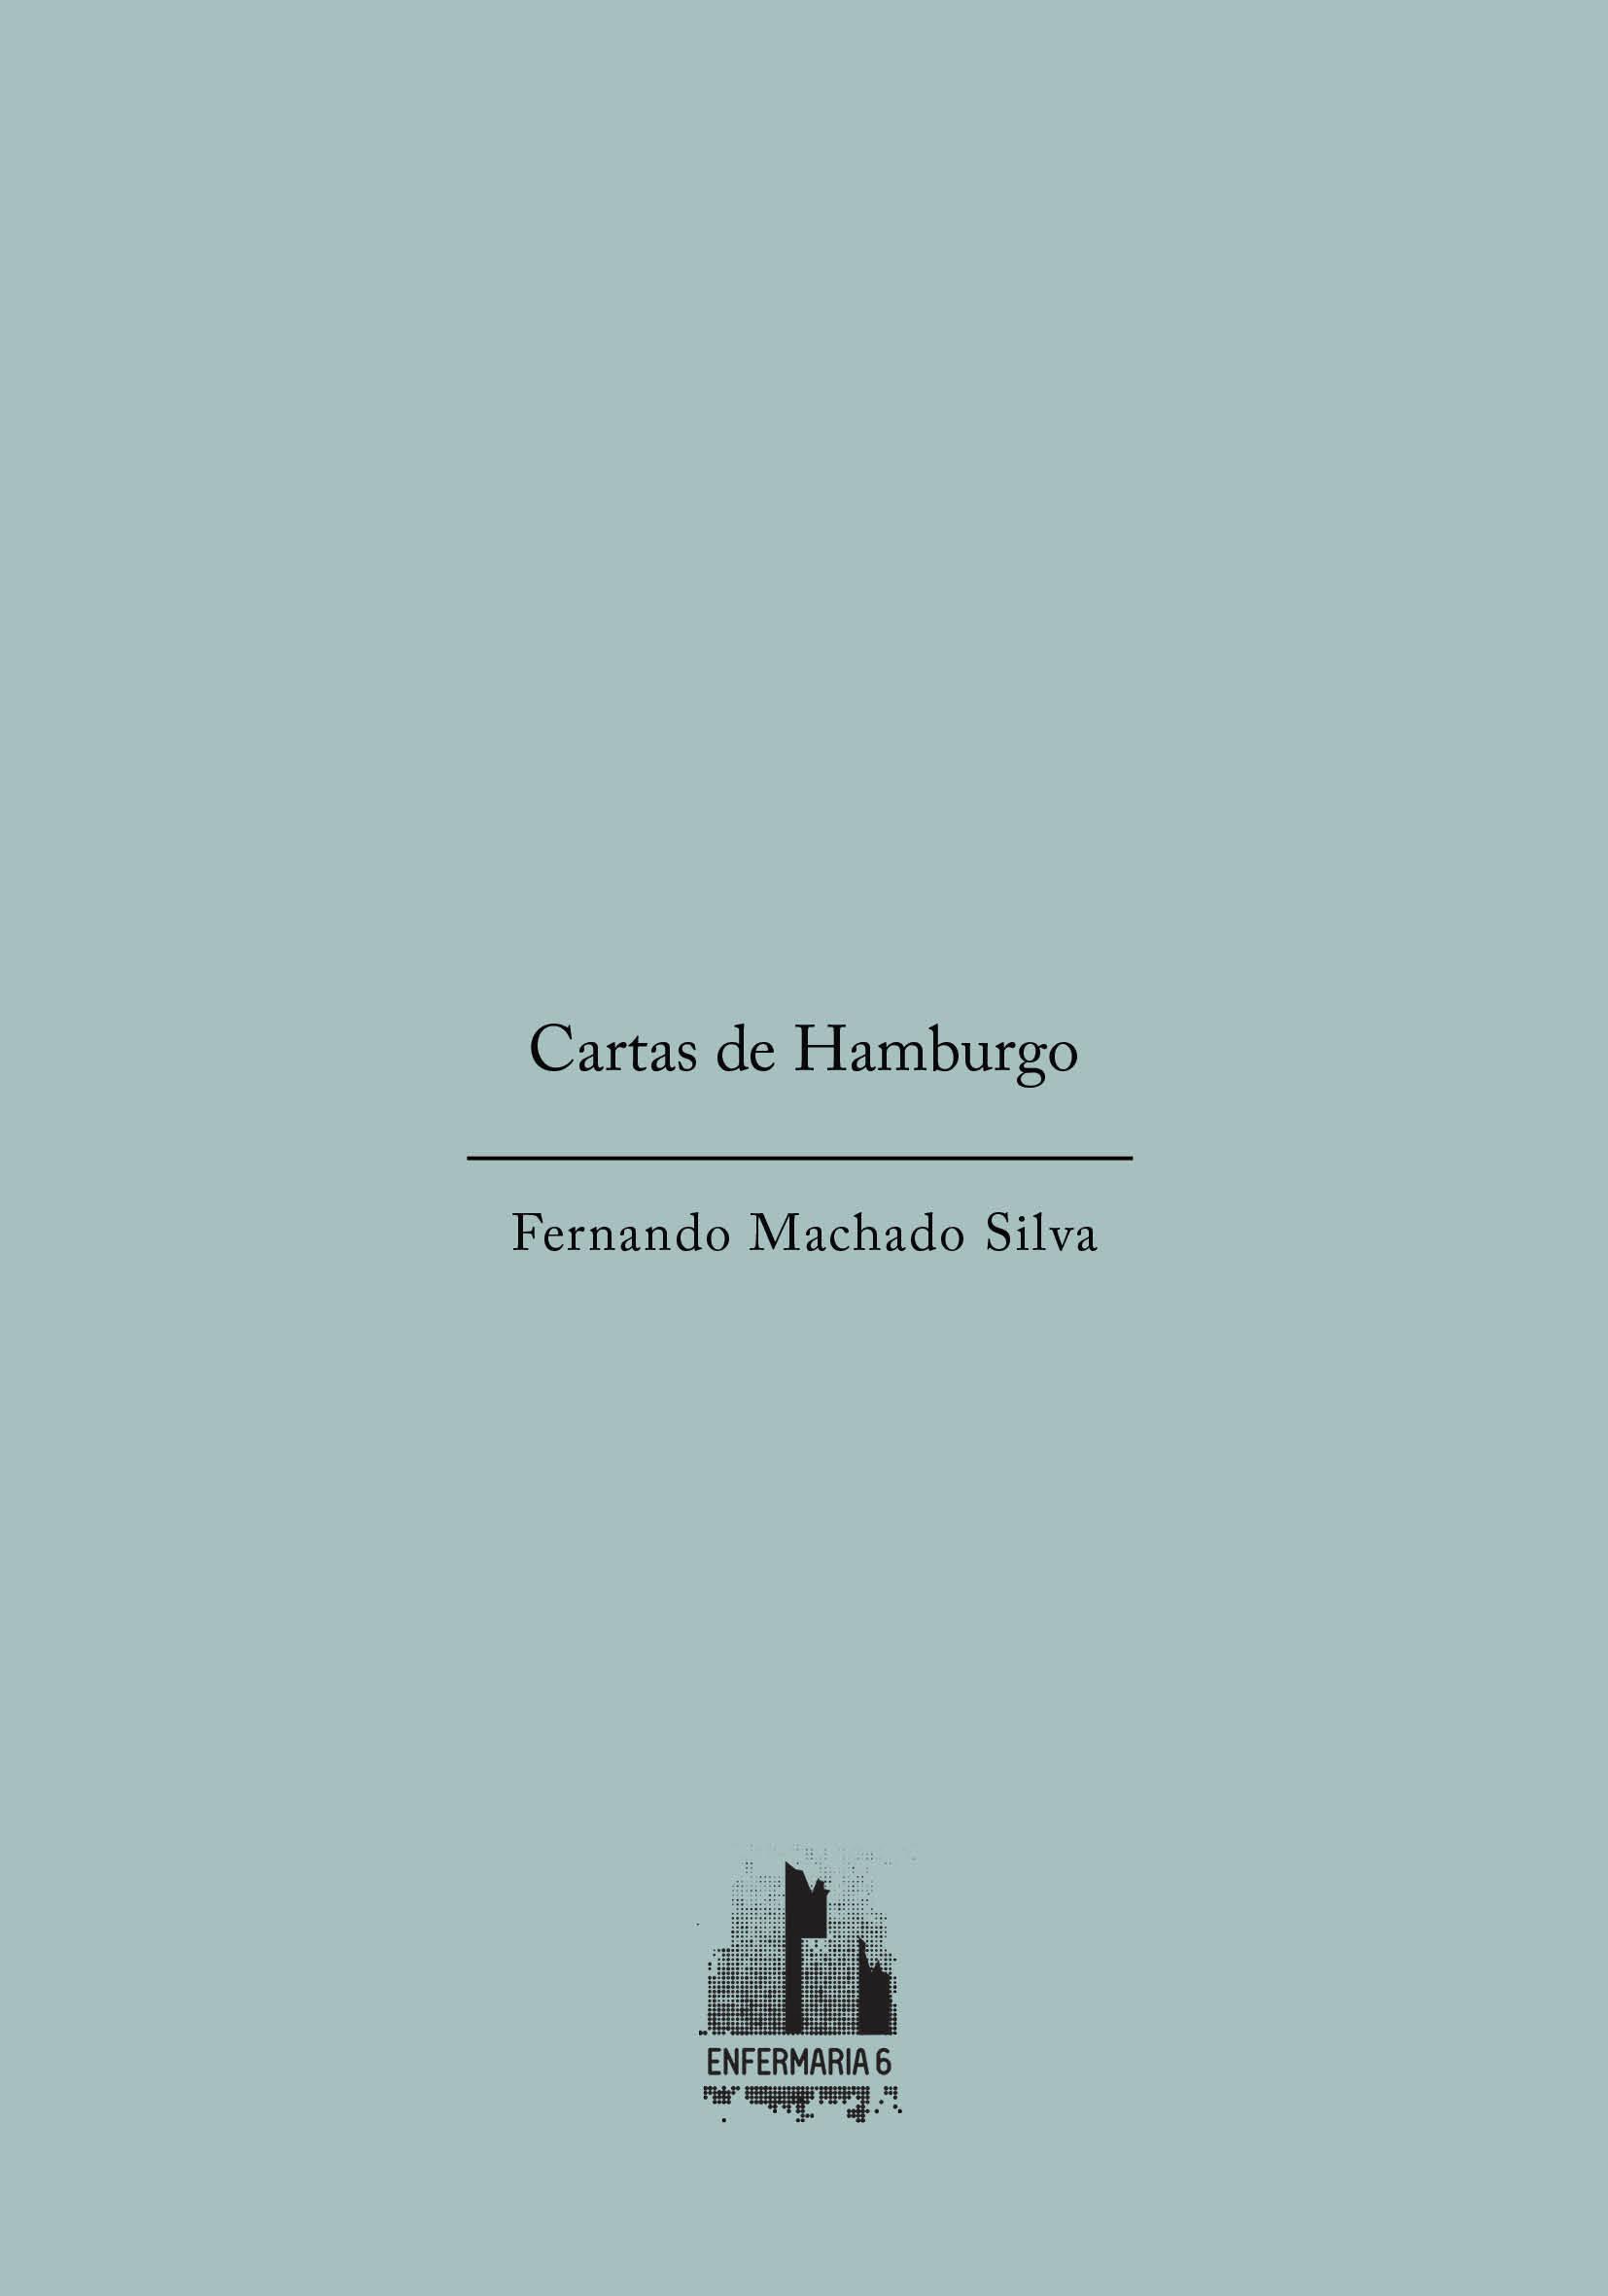 Fernando Machado Silva, Cartas de Hamburgo